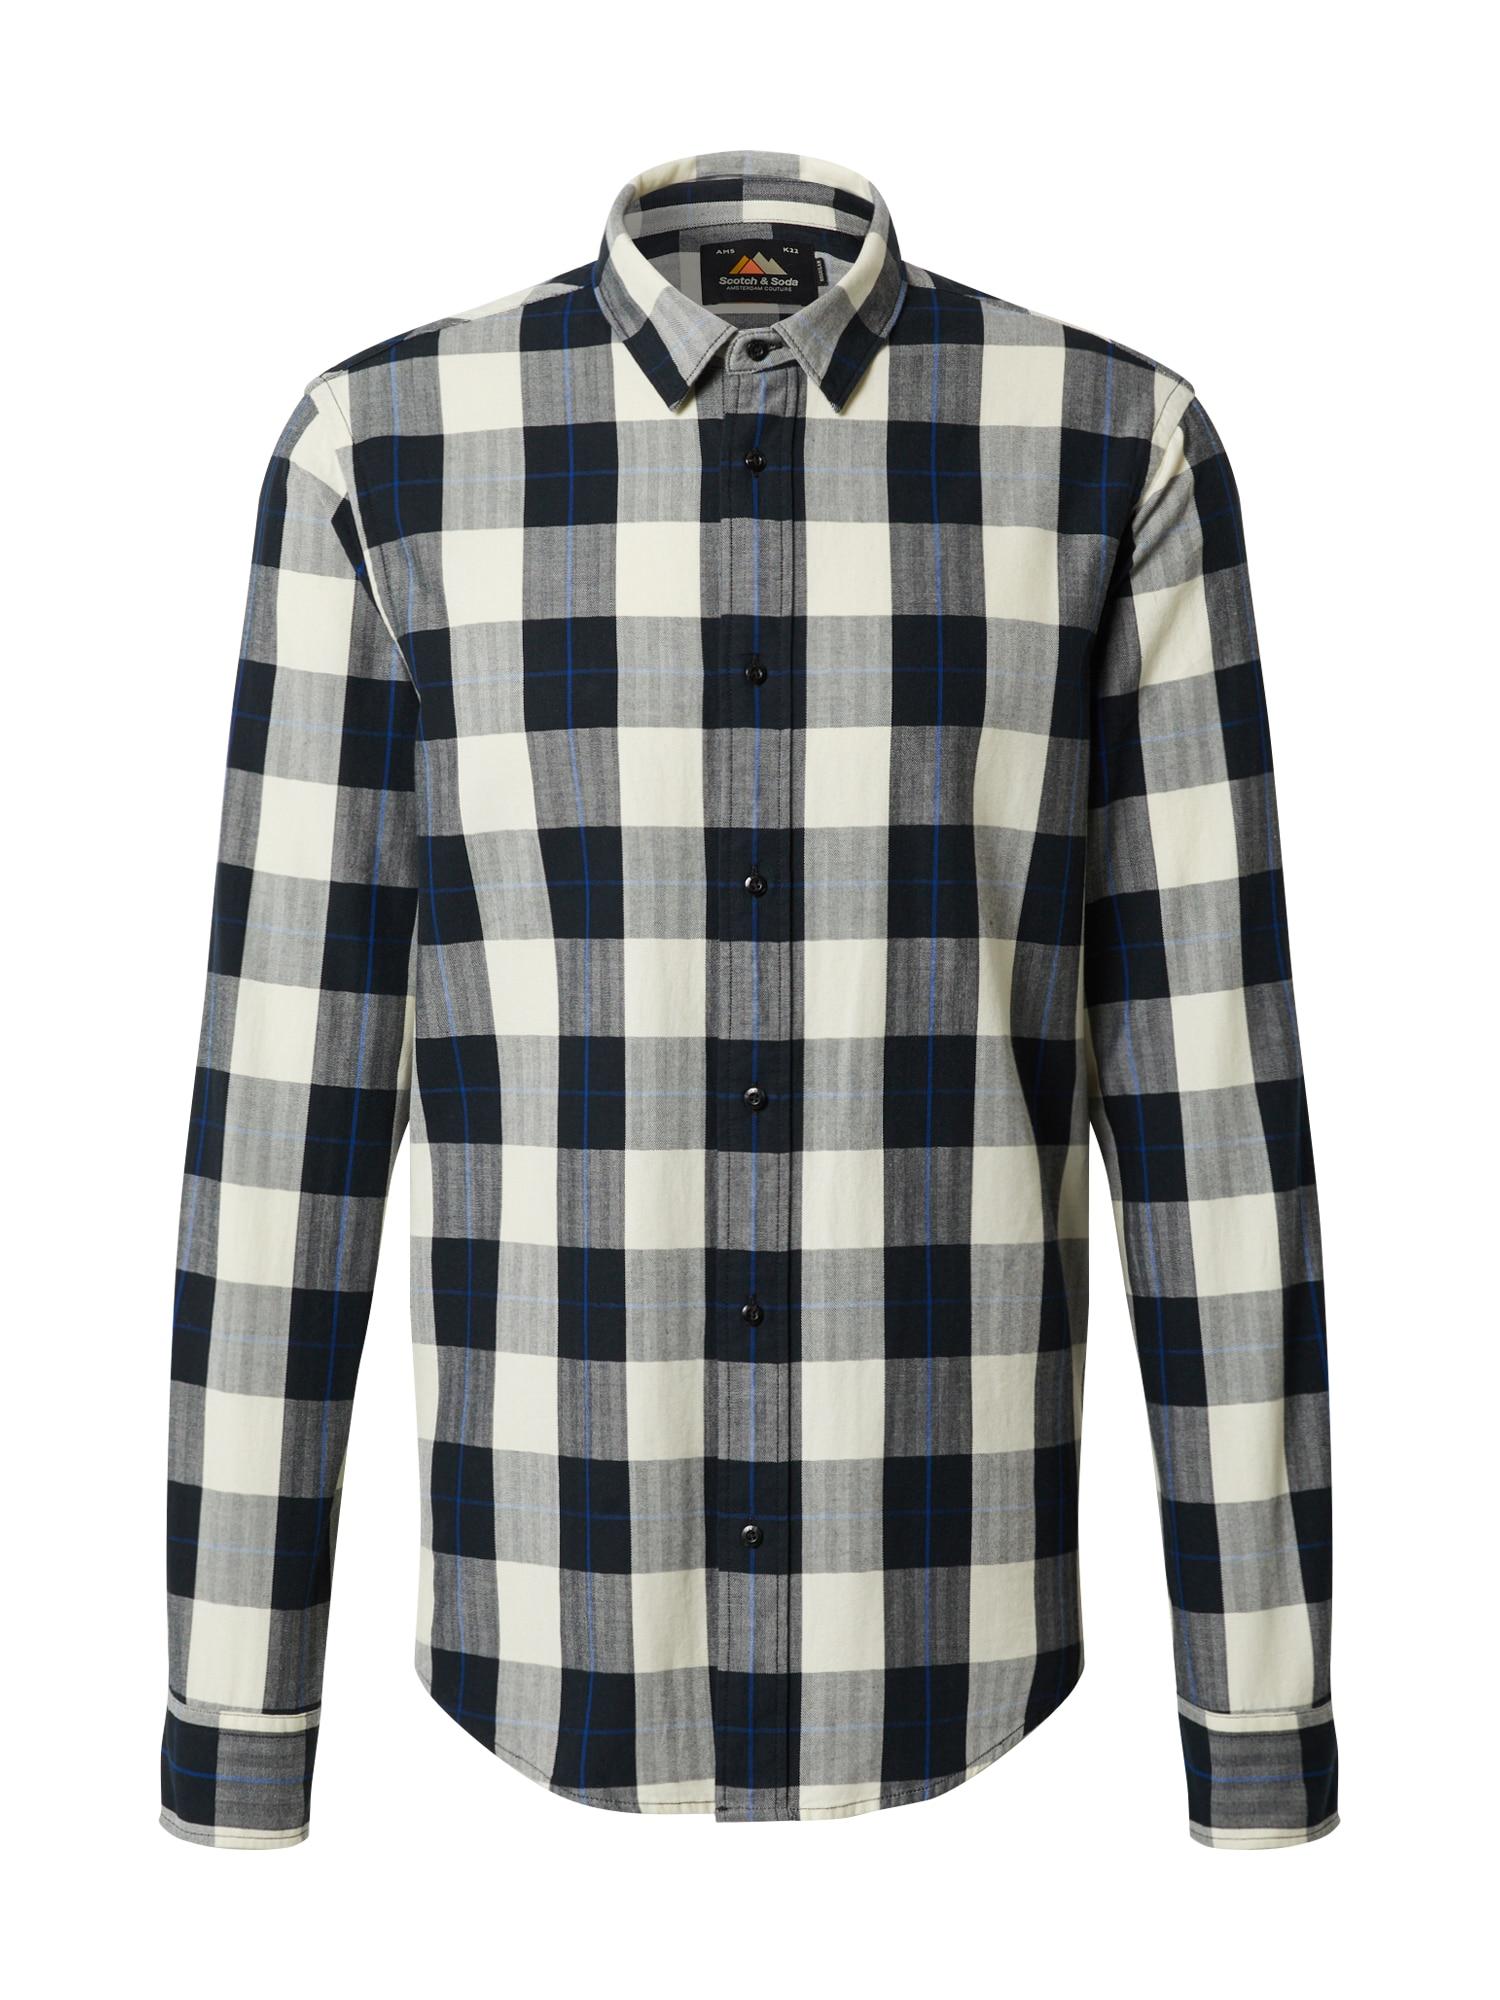 SCOTCH & SODA Marškiniai margai juoda / pilka / margai pilka / smėlio / mėlyna